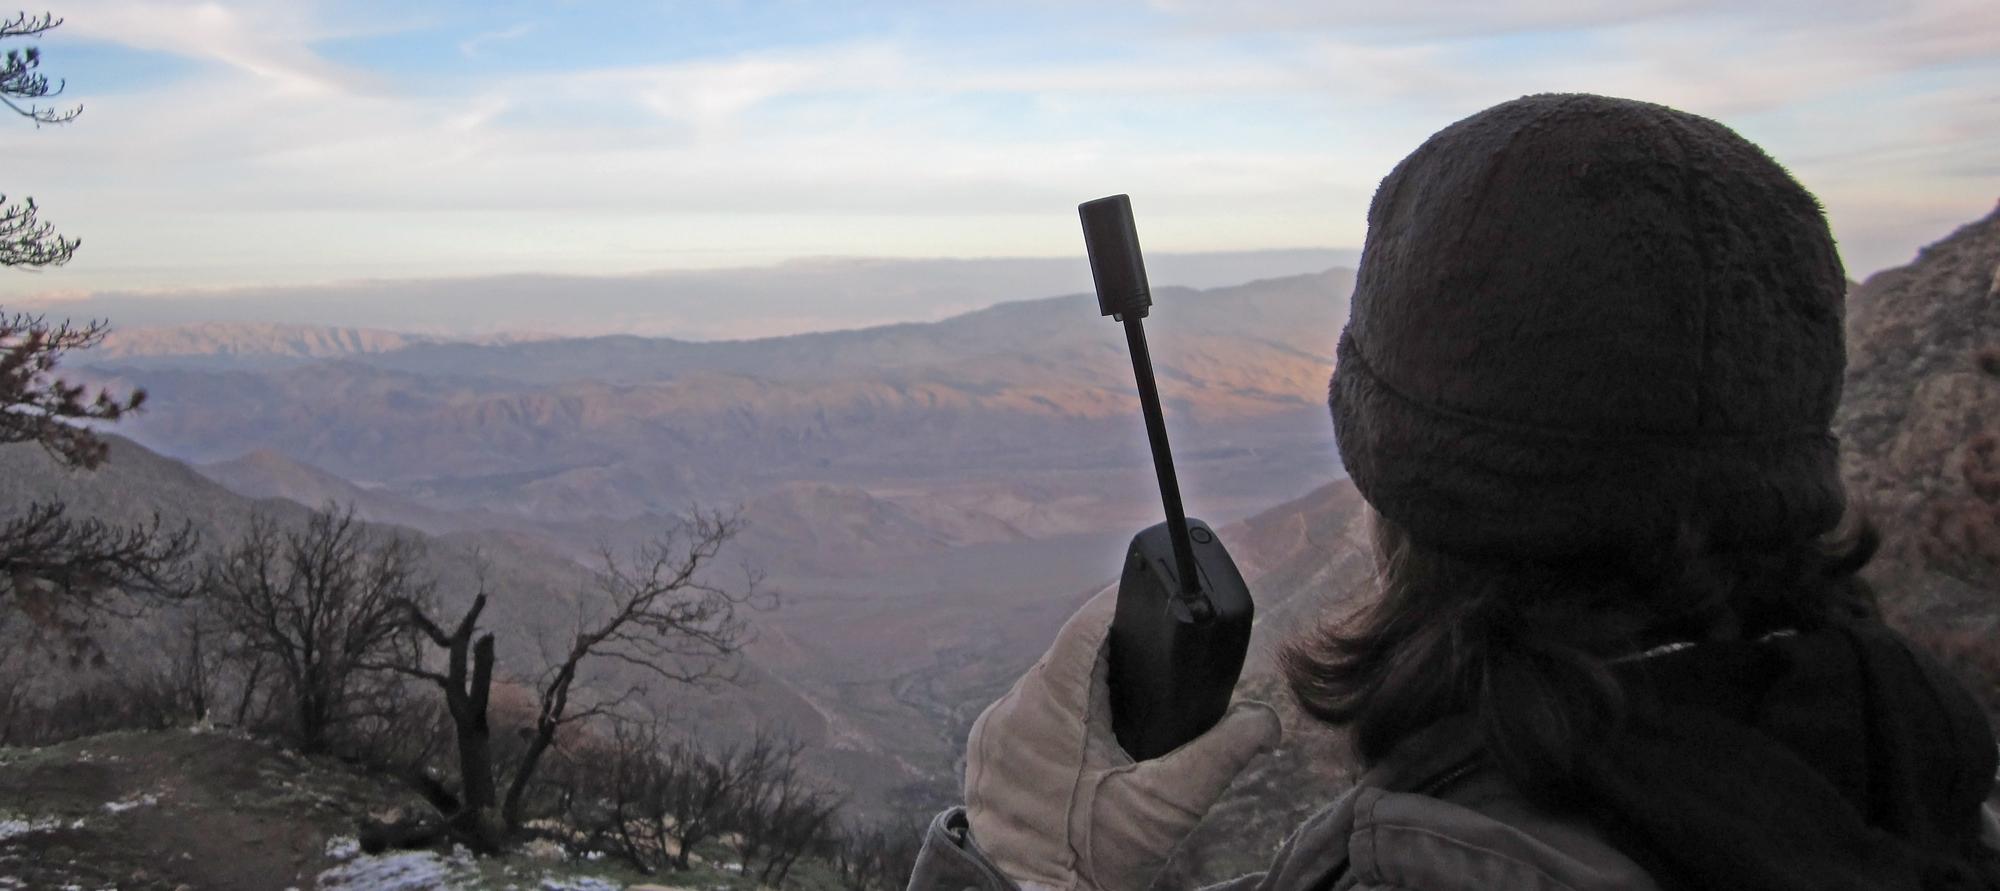 iridium-9555-satellite-phone-used-in-remote-area-northernaxcess.jpg